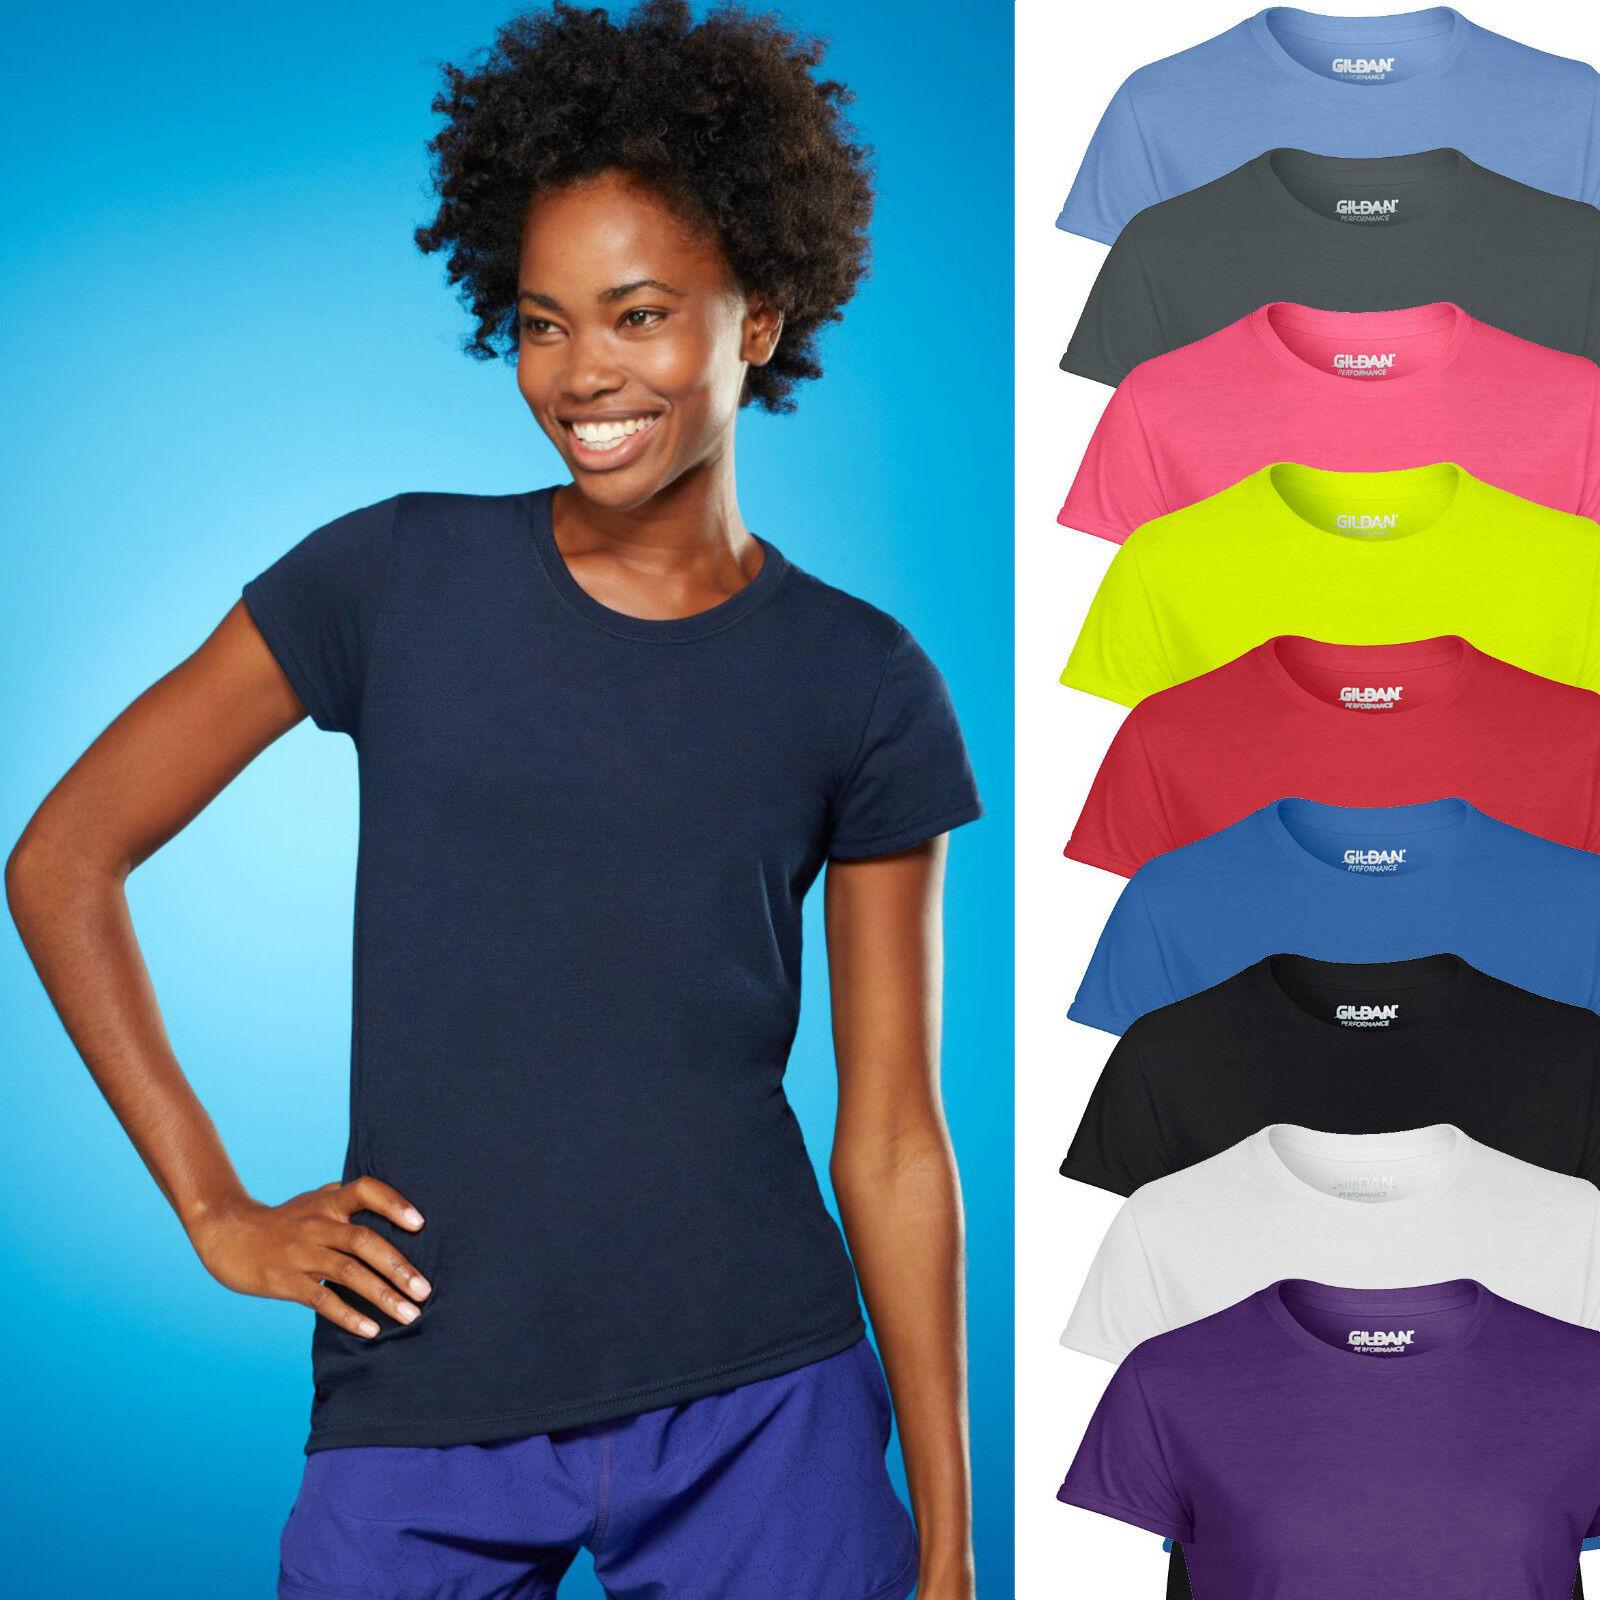 Damen Funktions T-Shirt Feuchtigkeitsregulierend Sport Fitness XS S M L XL XXL